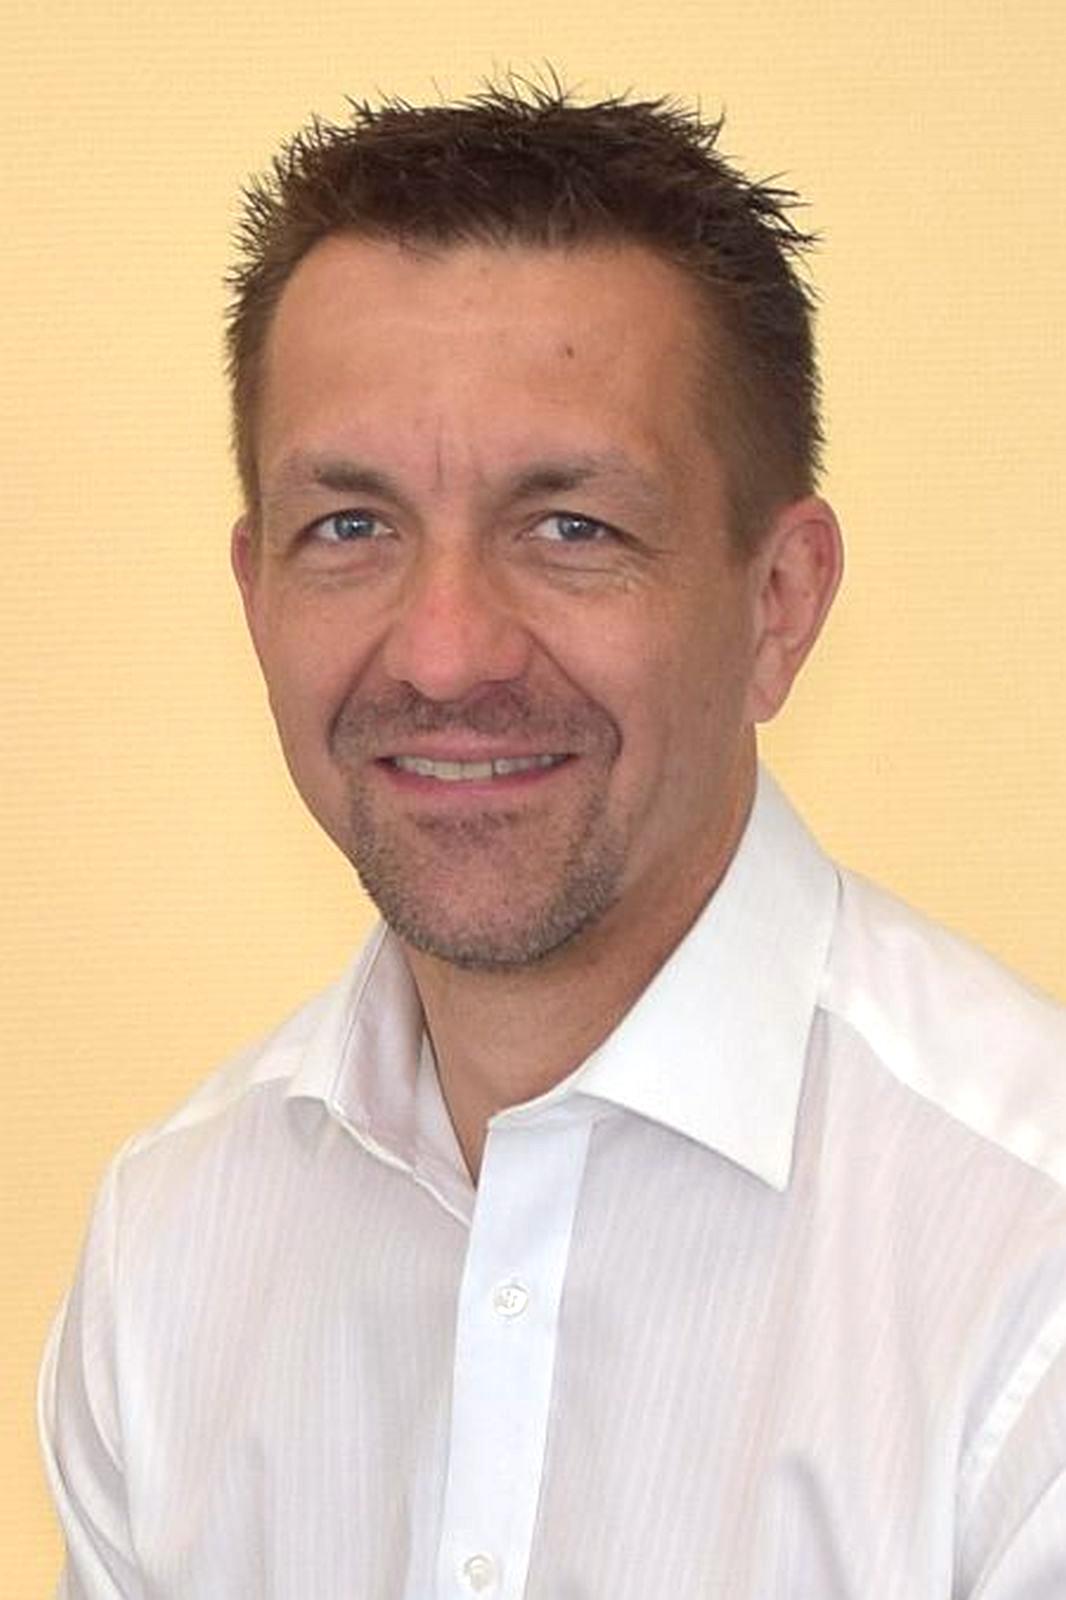 Geschäftsführer Eric Panske